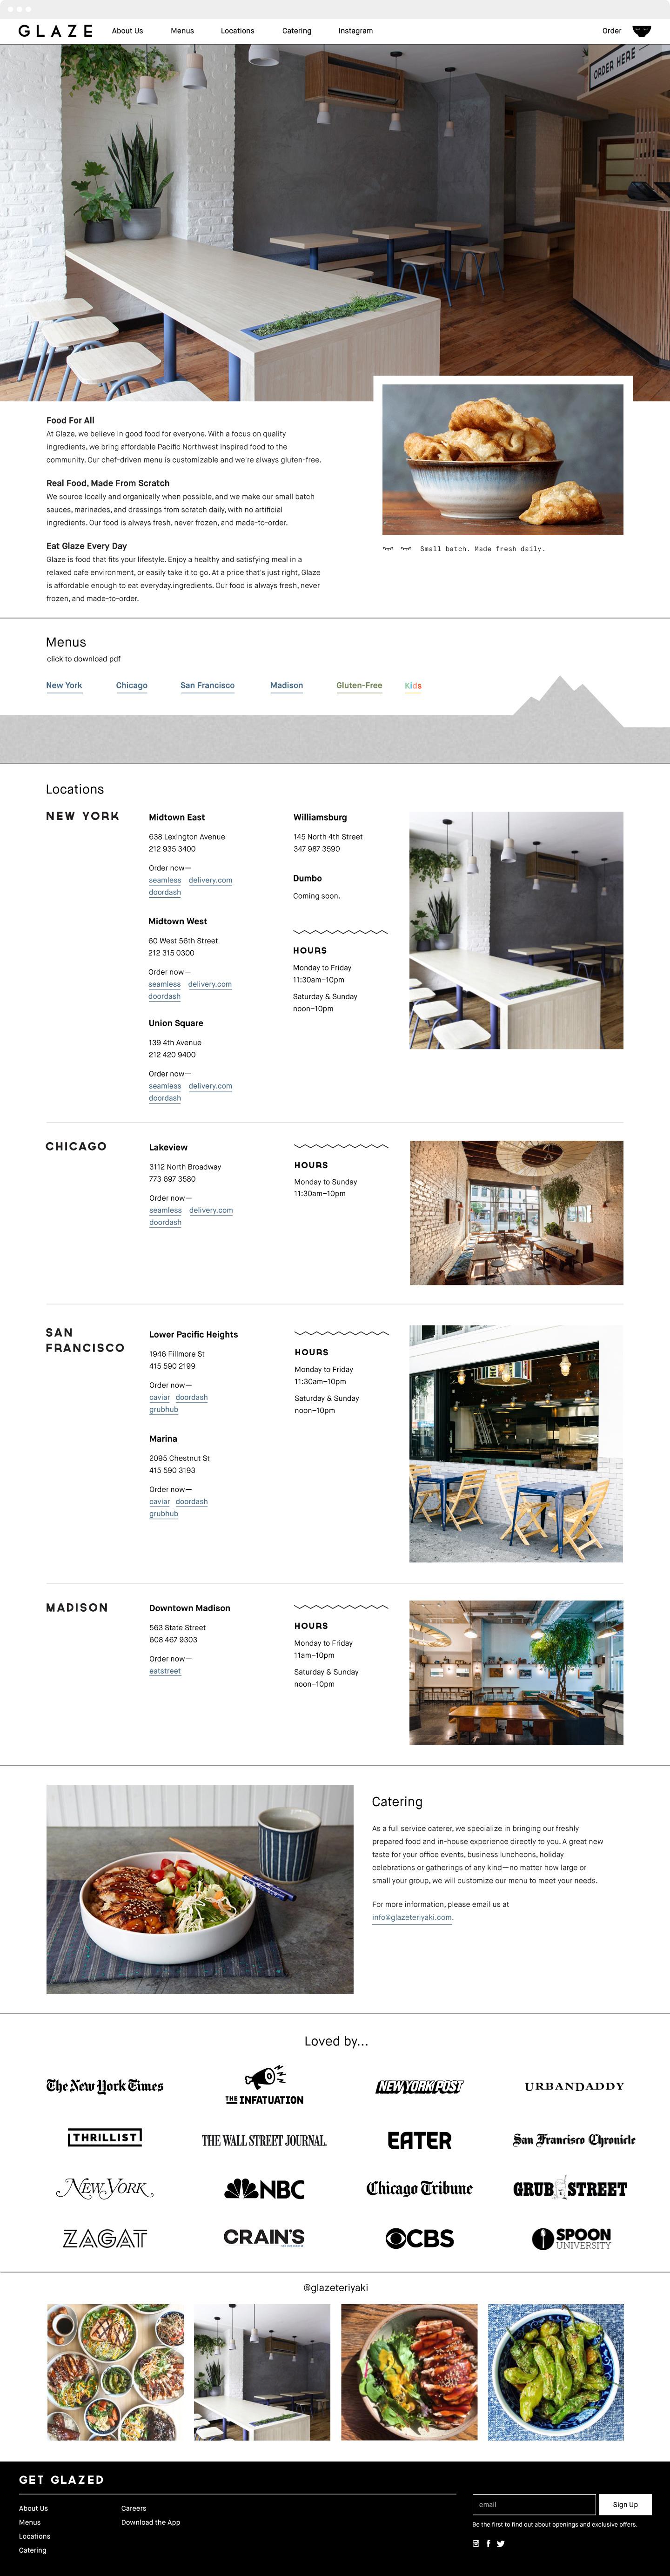 2017-KarenMessing-Glaze-Site